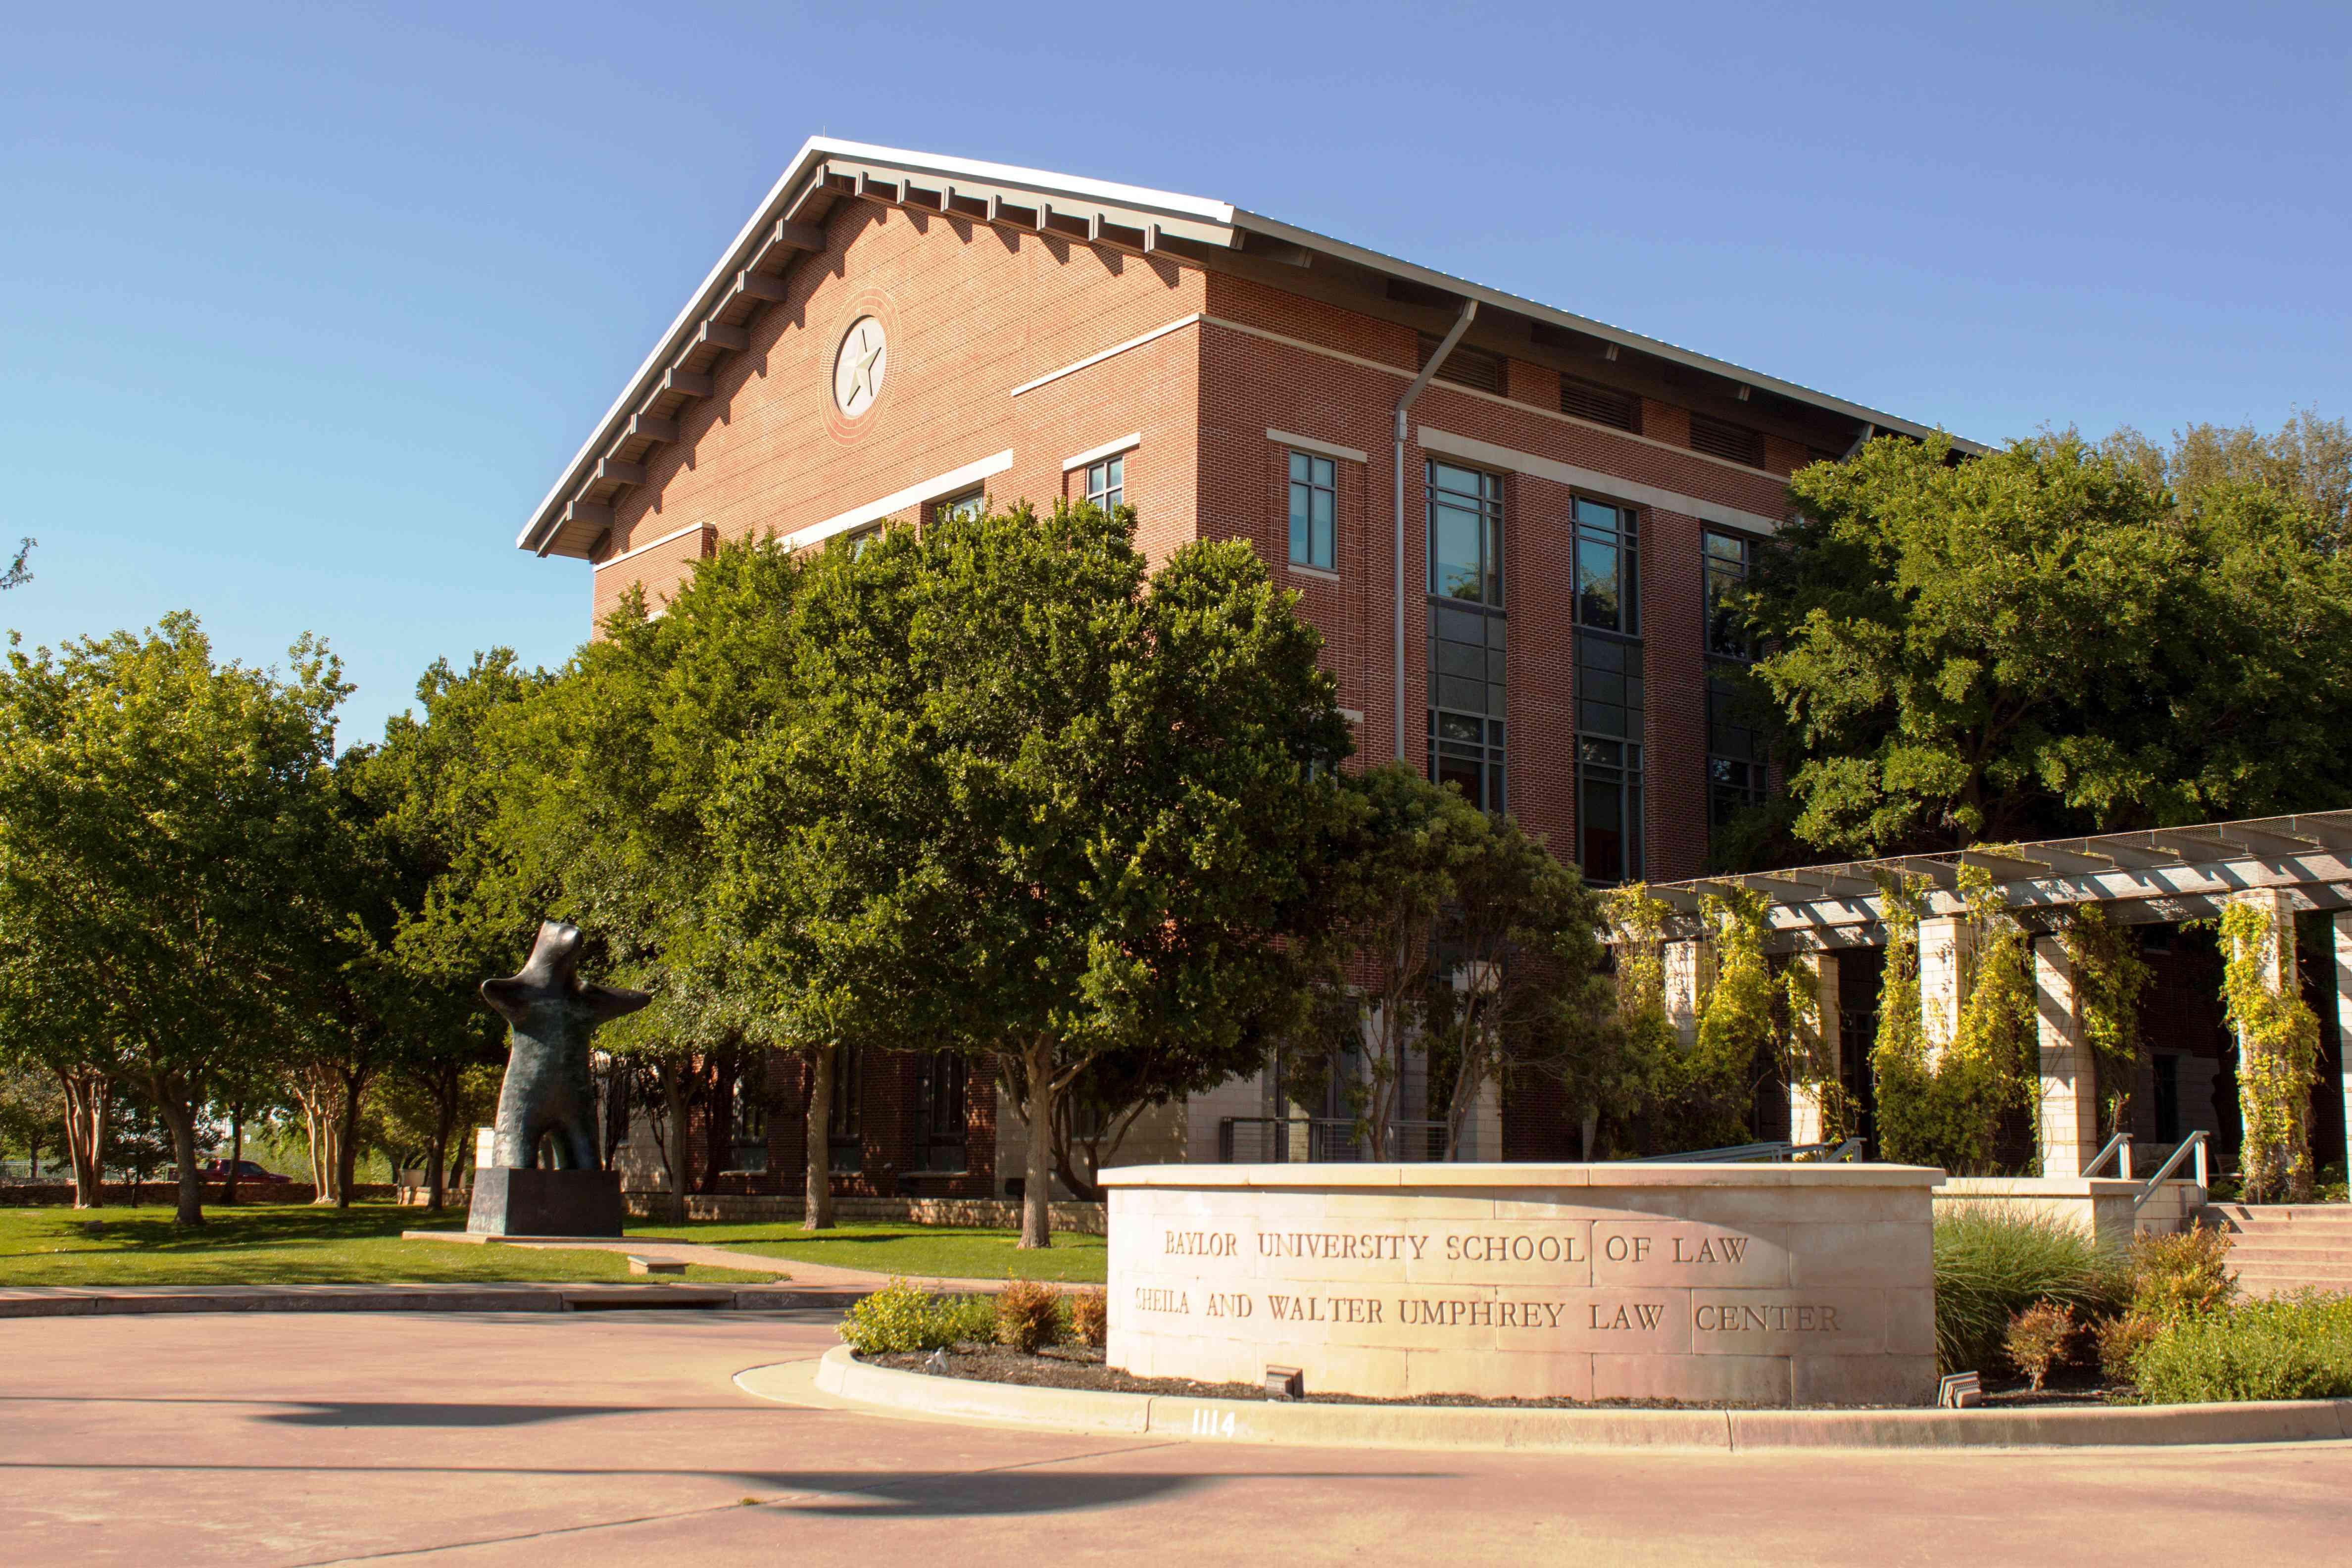 Baylor University School of Law